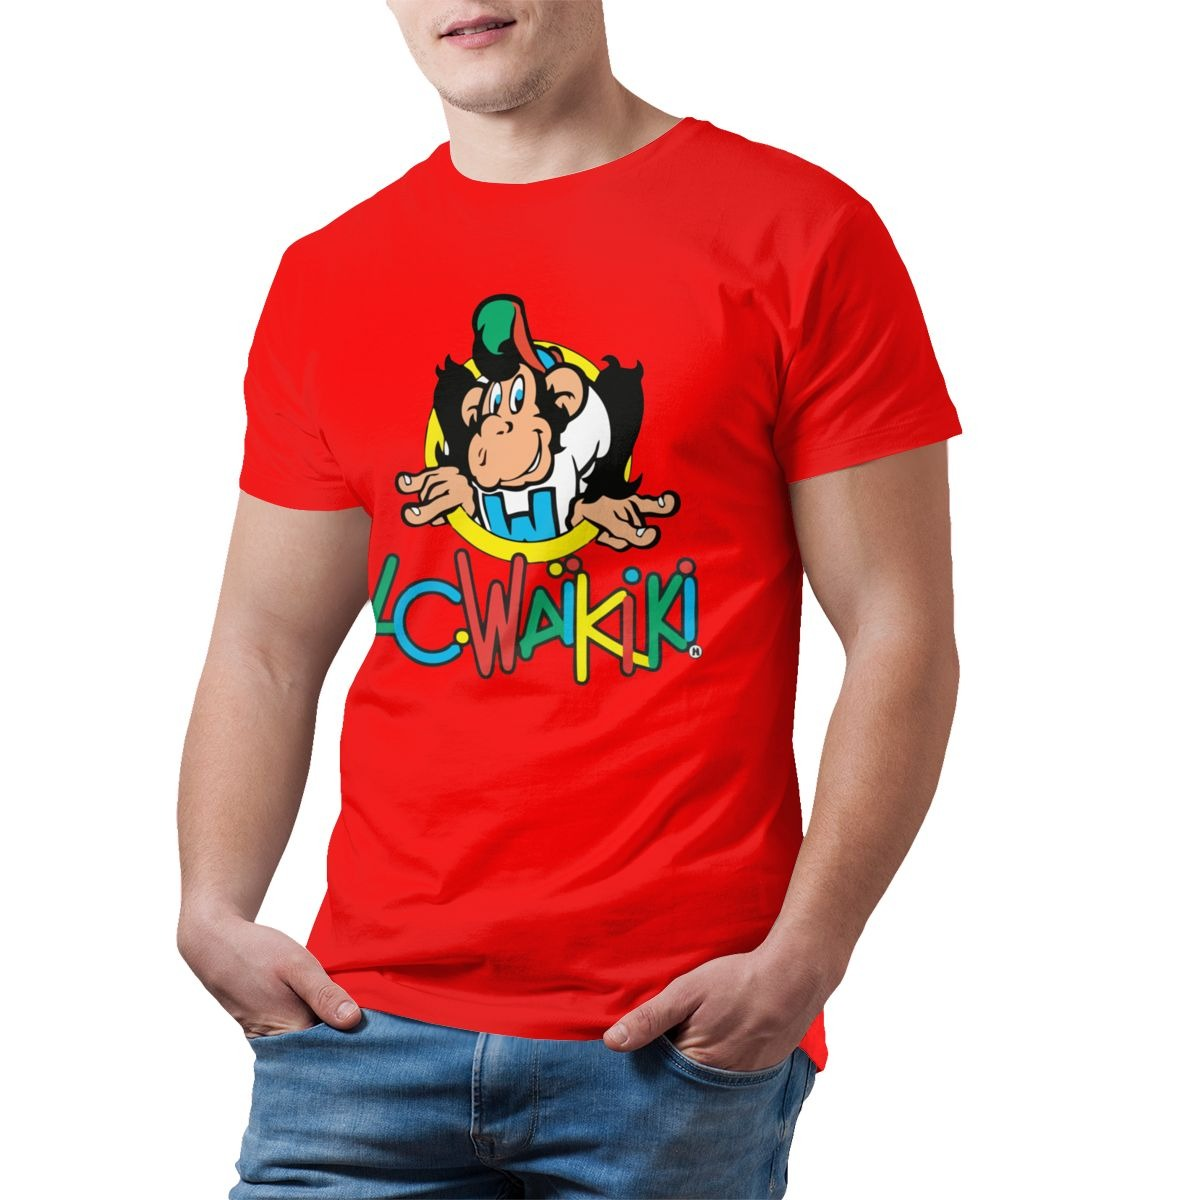 top monkey t shirt lc waikiki monkey merchandise t shirt graphic cotton tee shirt mens short sleeves beach tshirt print casual 4923 - PewDiePie Merch